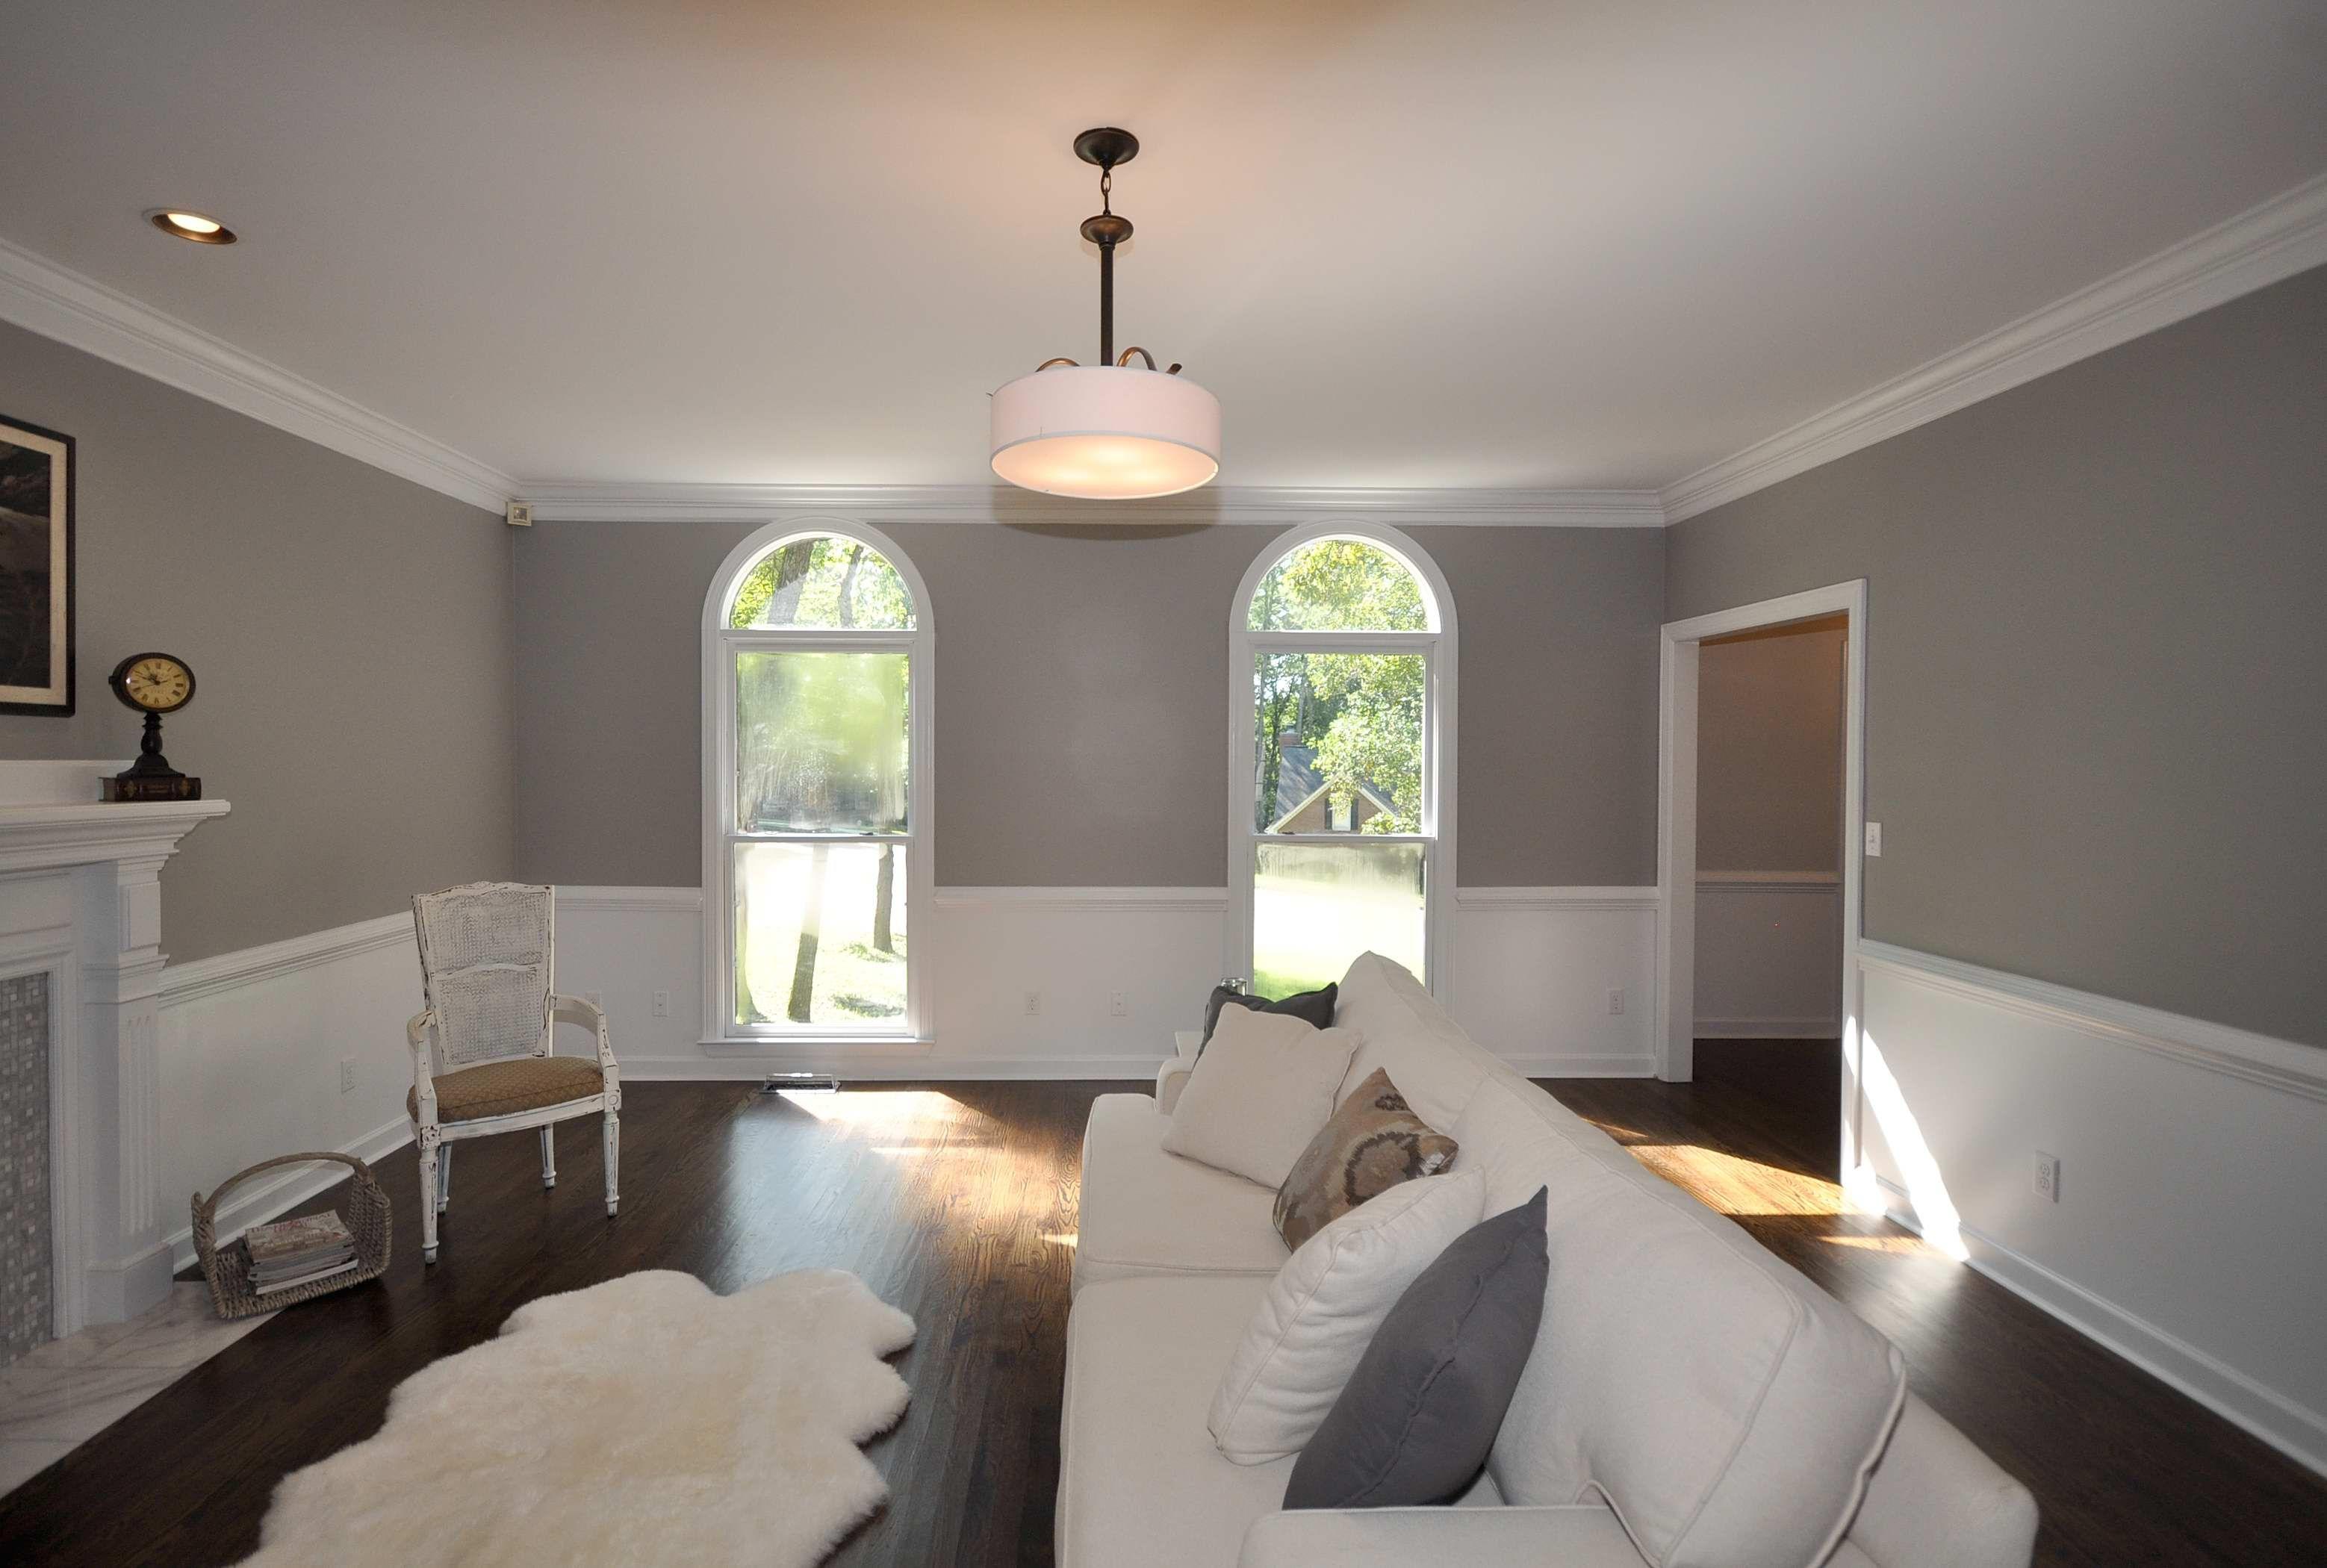 Valsapr Rocky Bluffs Bedroom Makeover In 2019 Paint